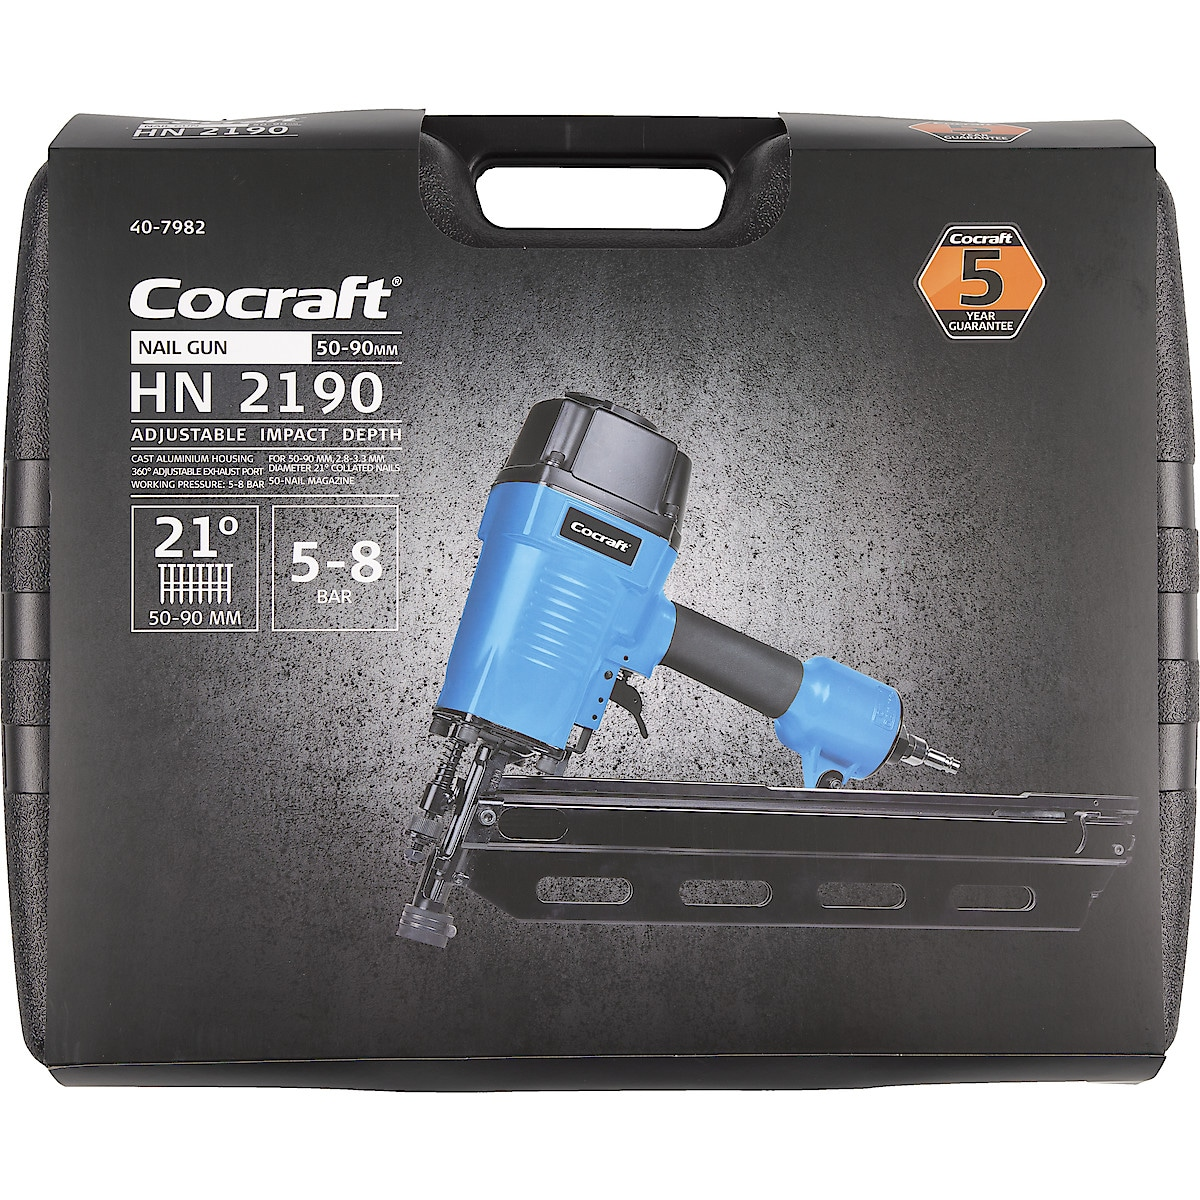 Naulain Cocraft HN 2190